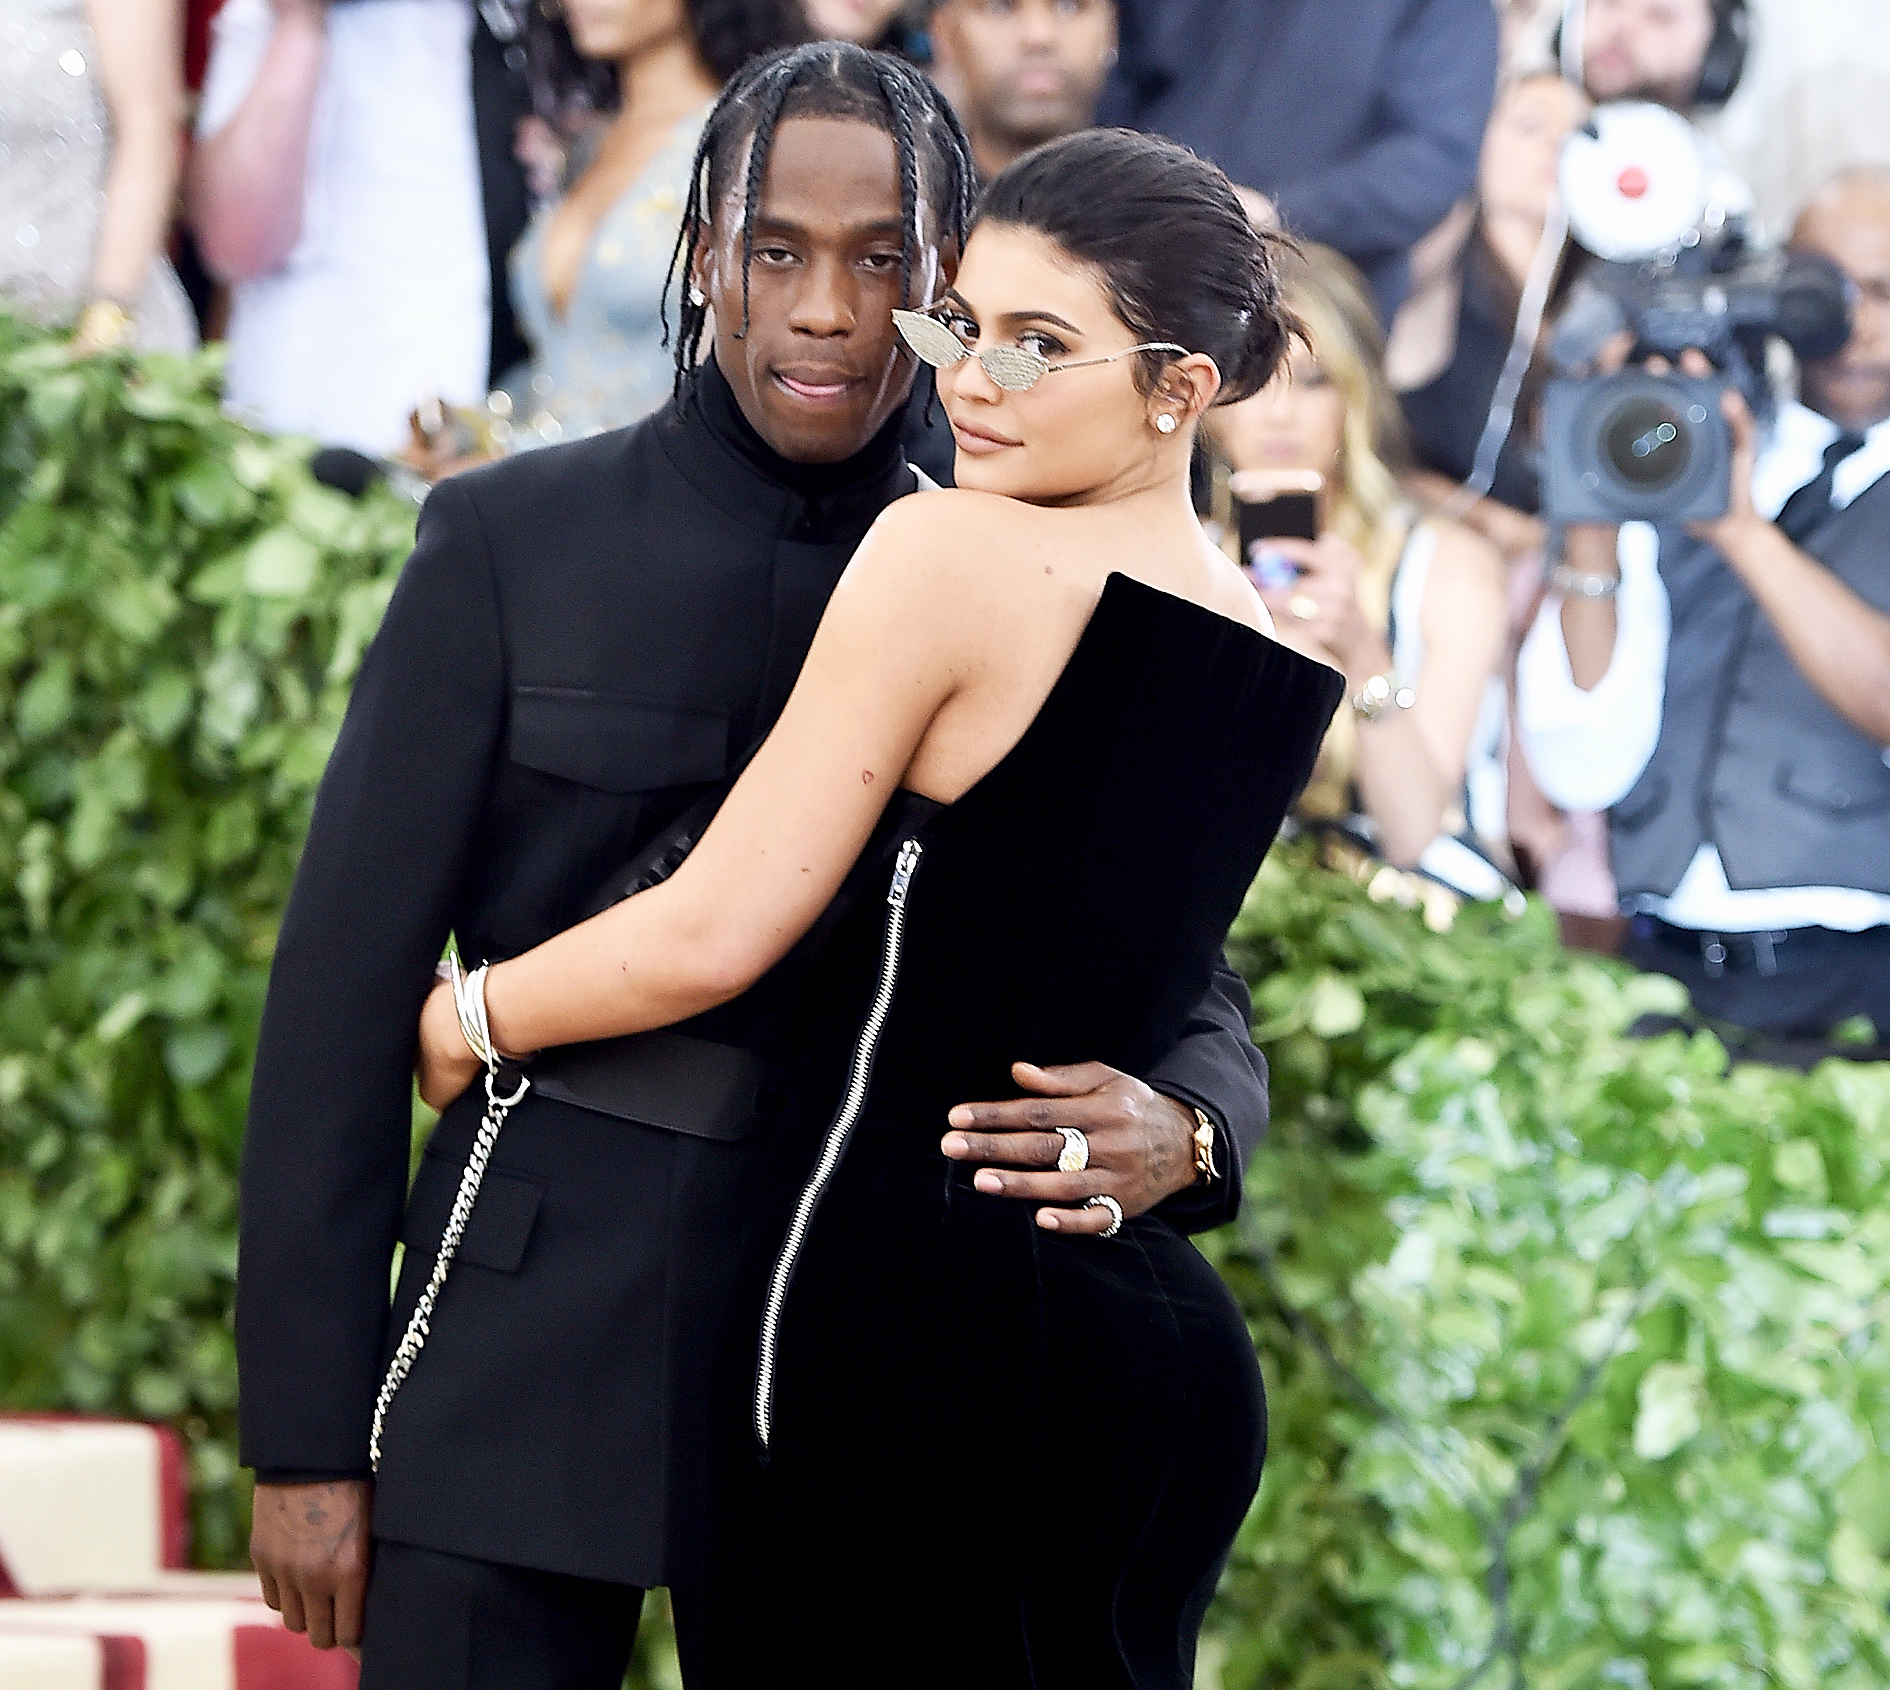 Kylie Jenner Slams Rumors Travis Scott Split - Travis Scott and Kylie Jenner attend the Heavenly Bodies: Fashion & The Catholic Imagination Costume Institute Gala at The Metropolitan Museum of Art on May 7, 2018 in New York City.